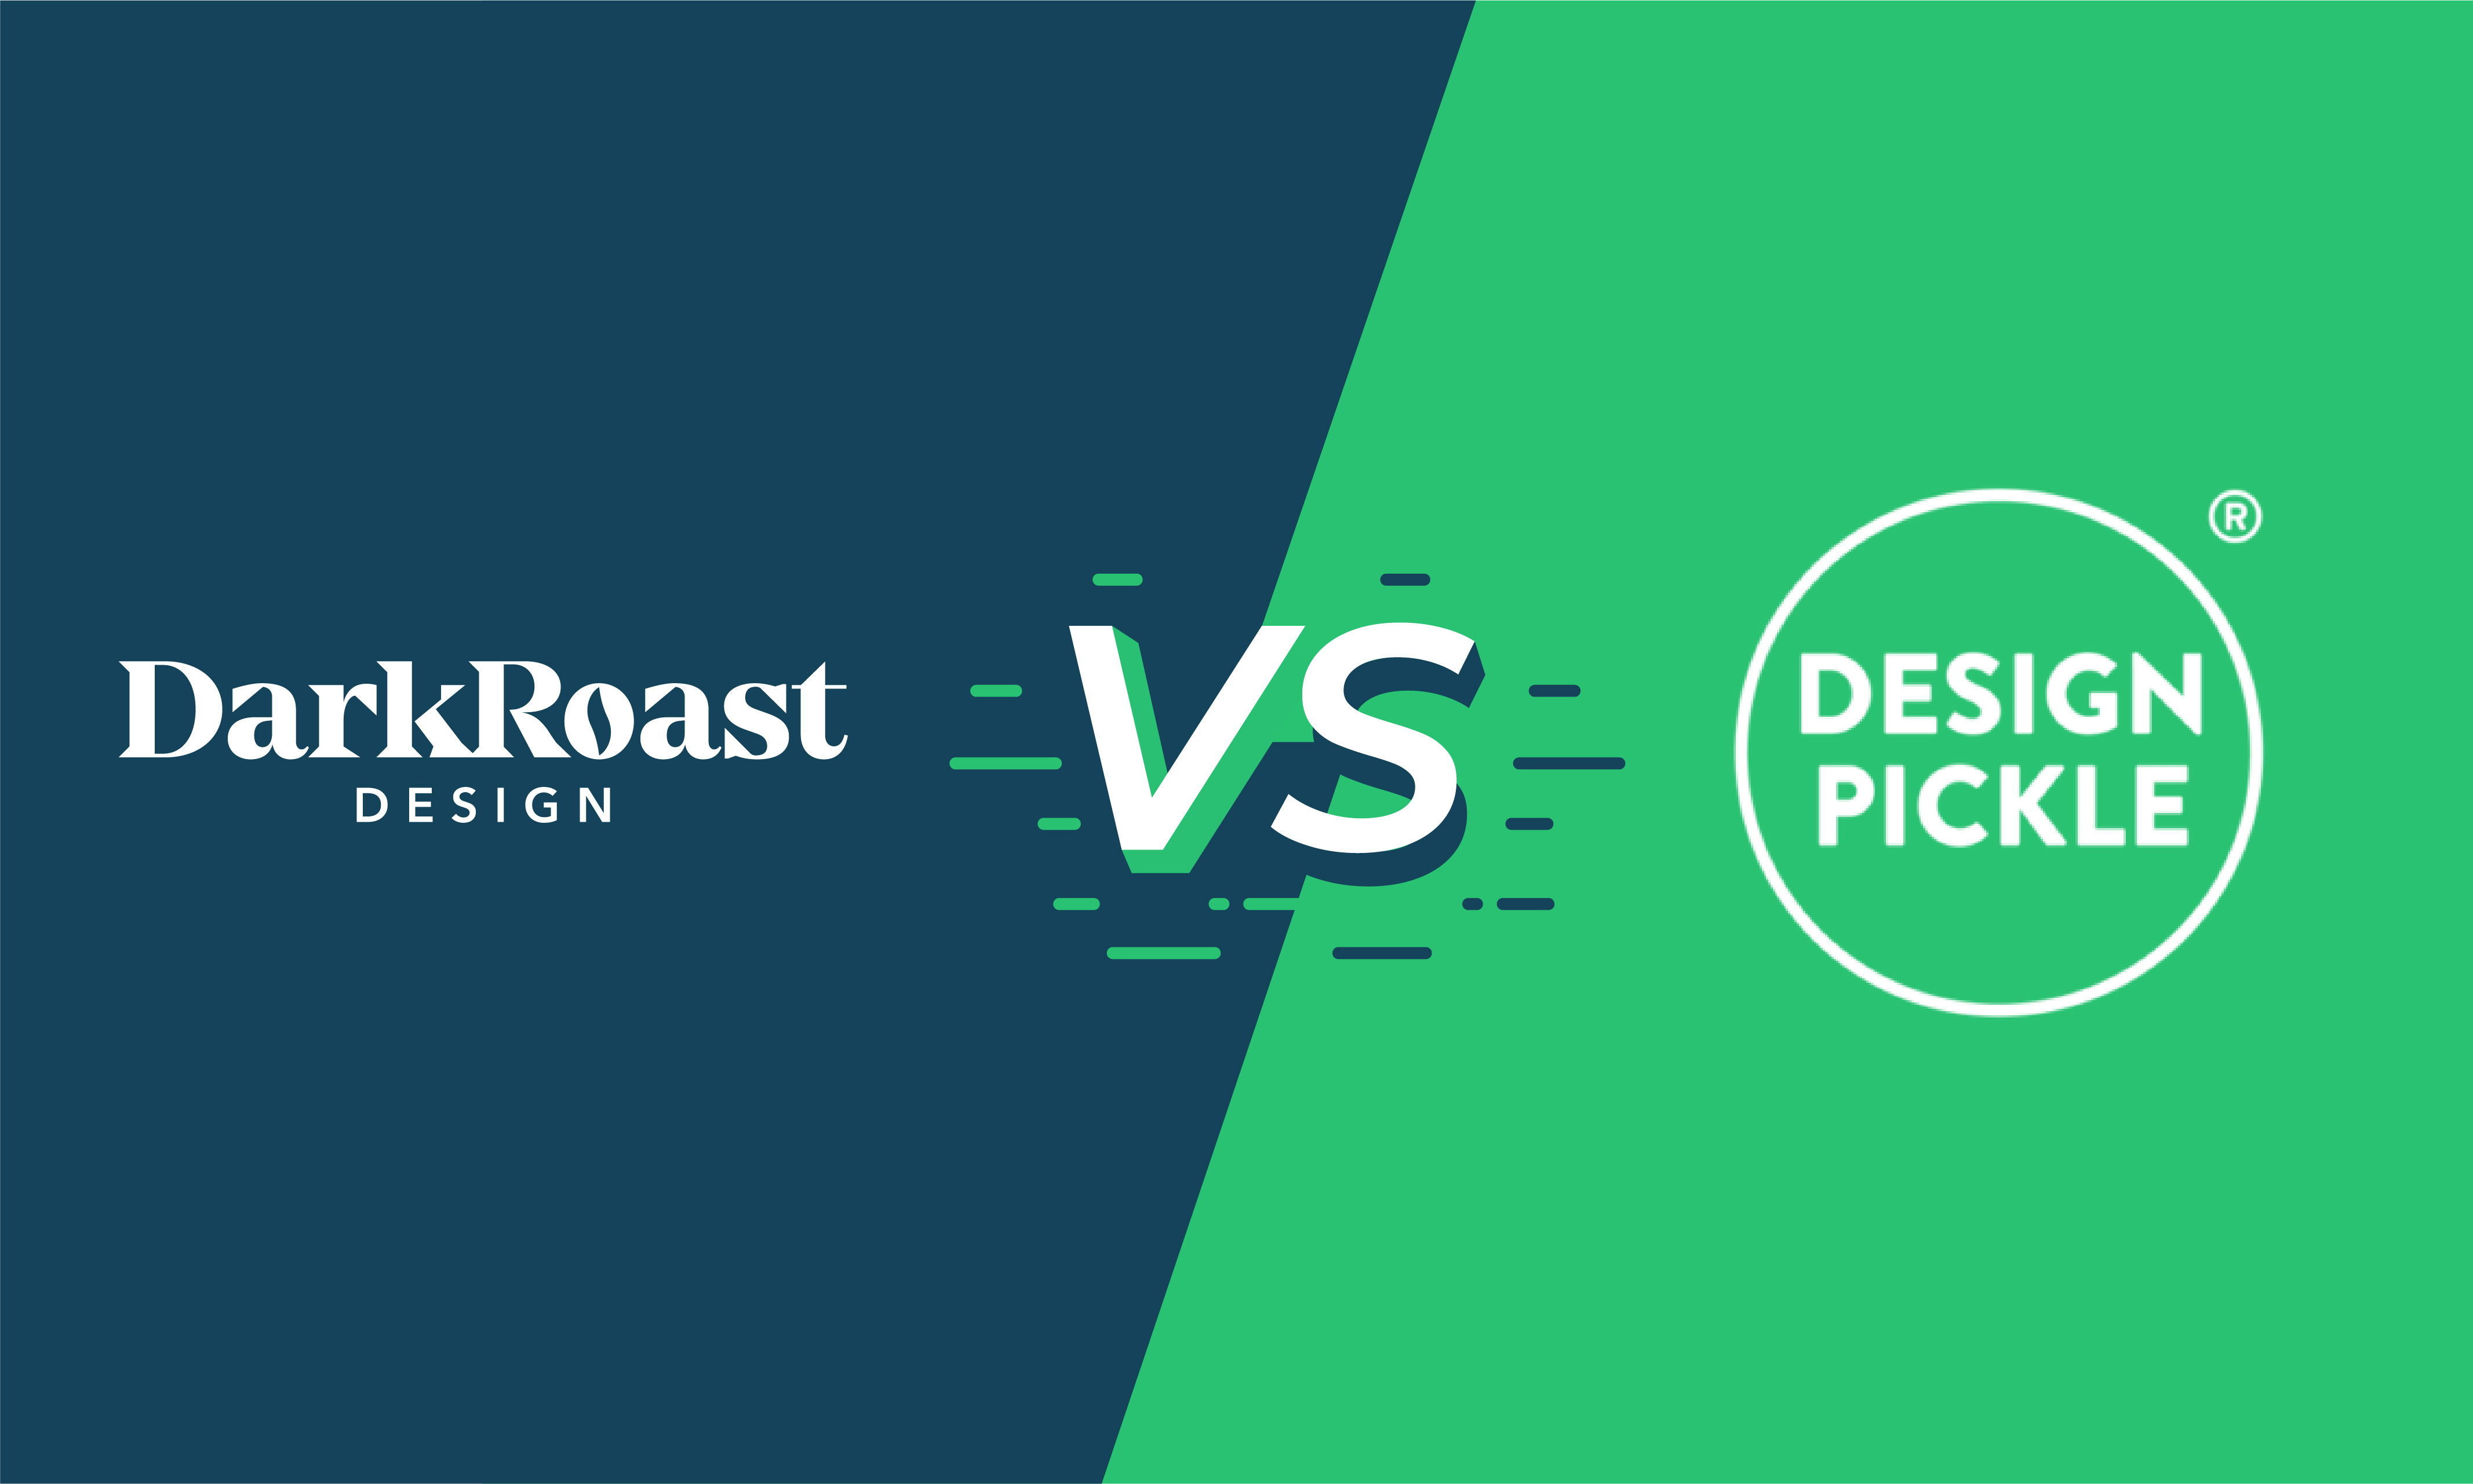 Design Pickle vs DarkRoast [2021 UPDATE]